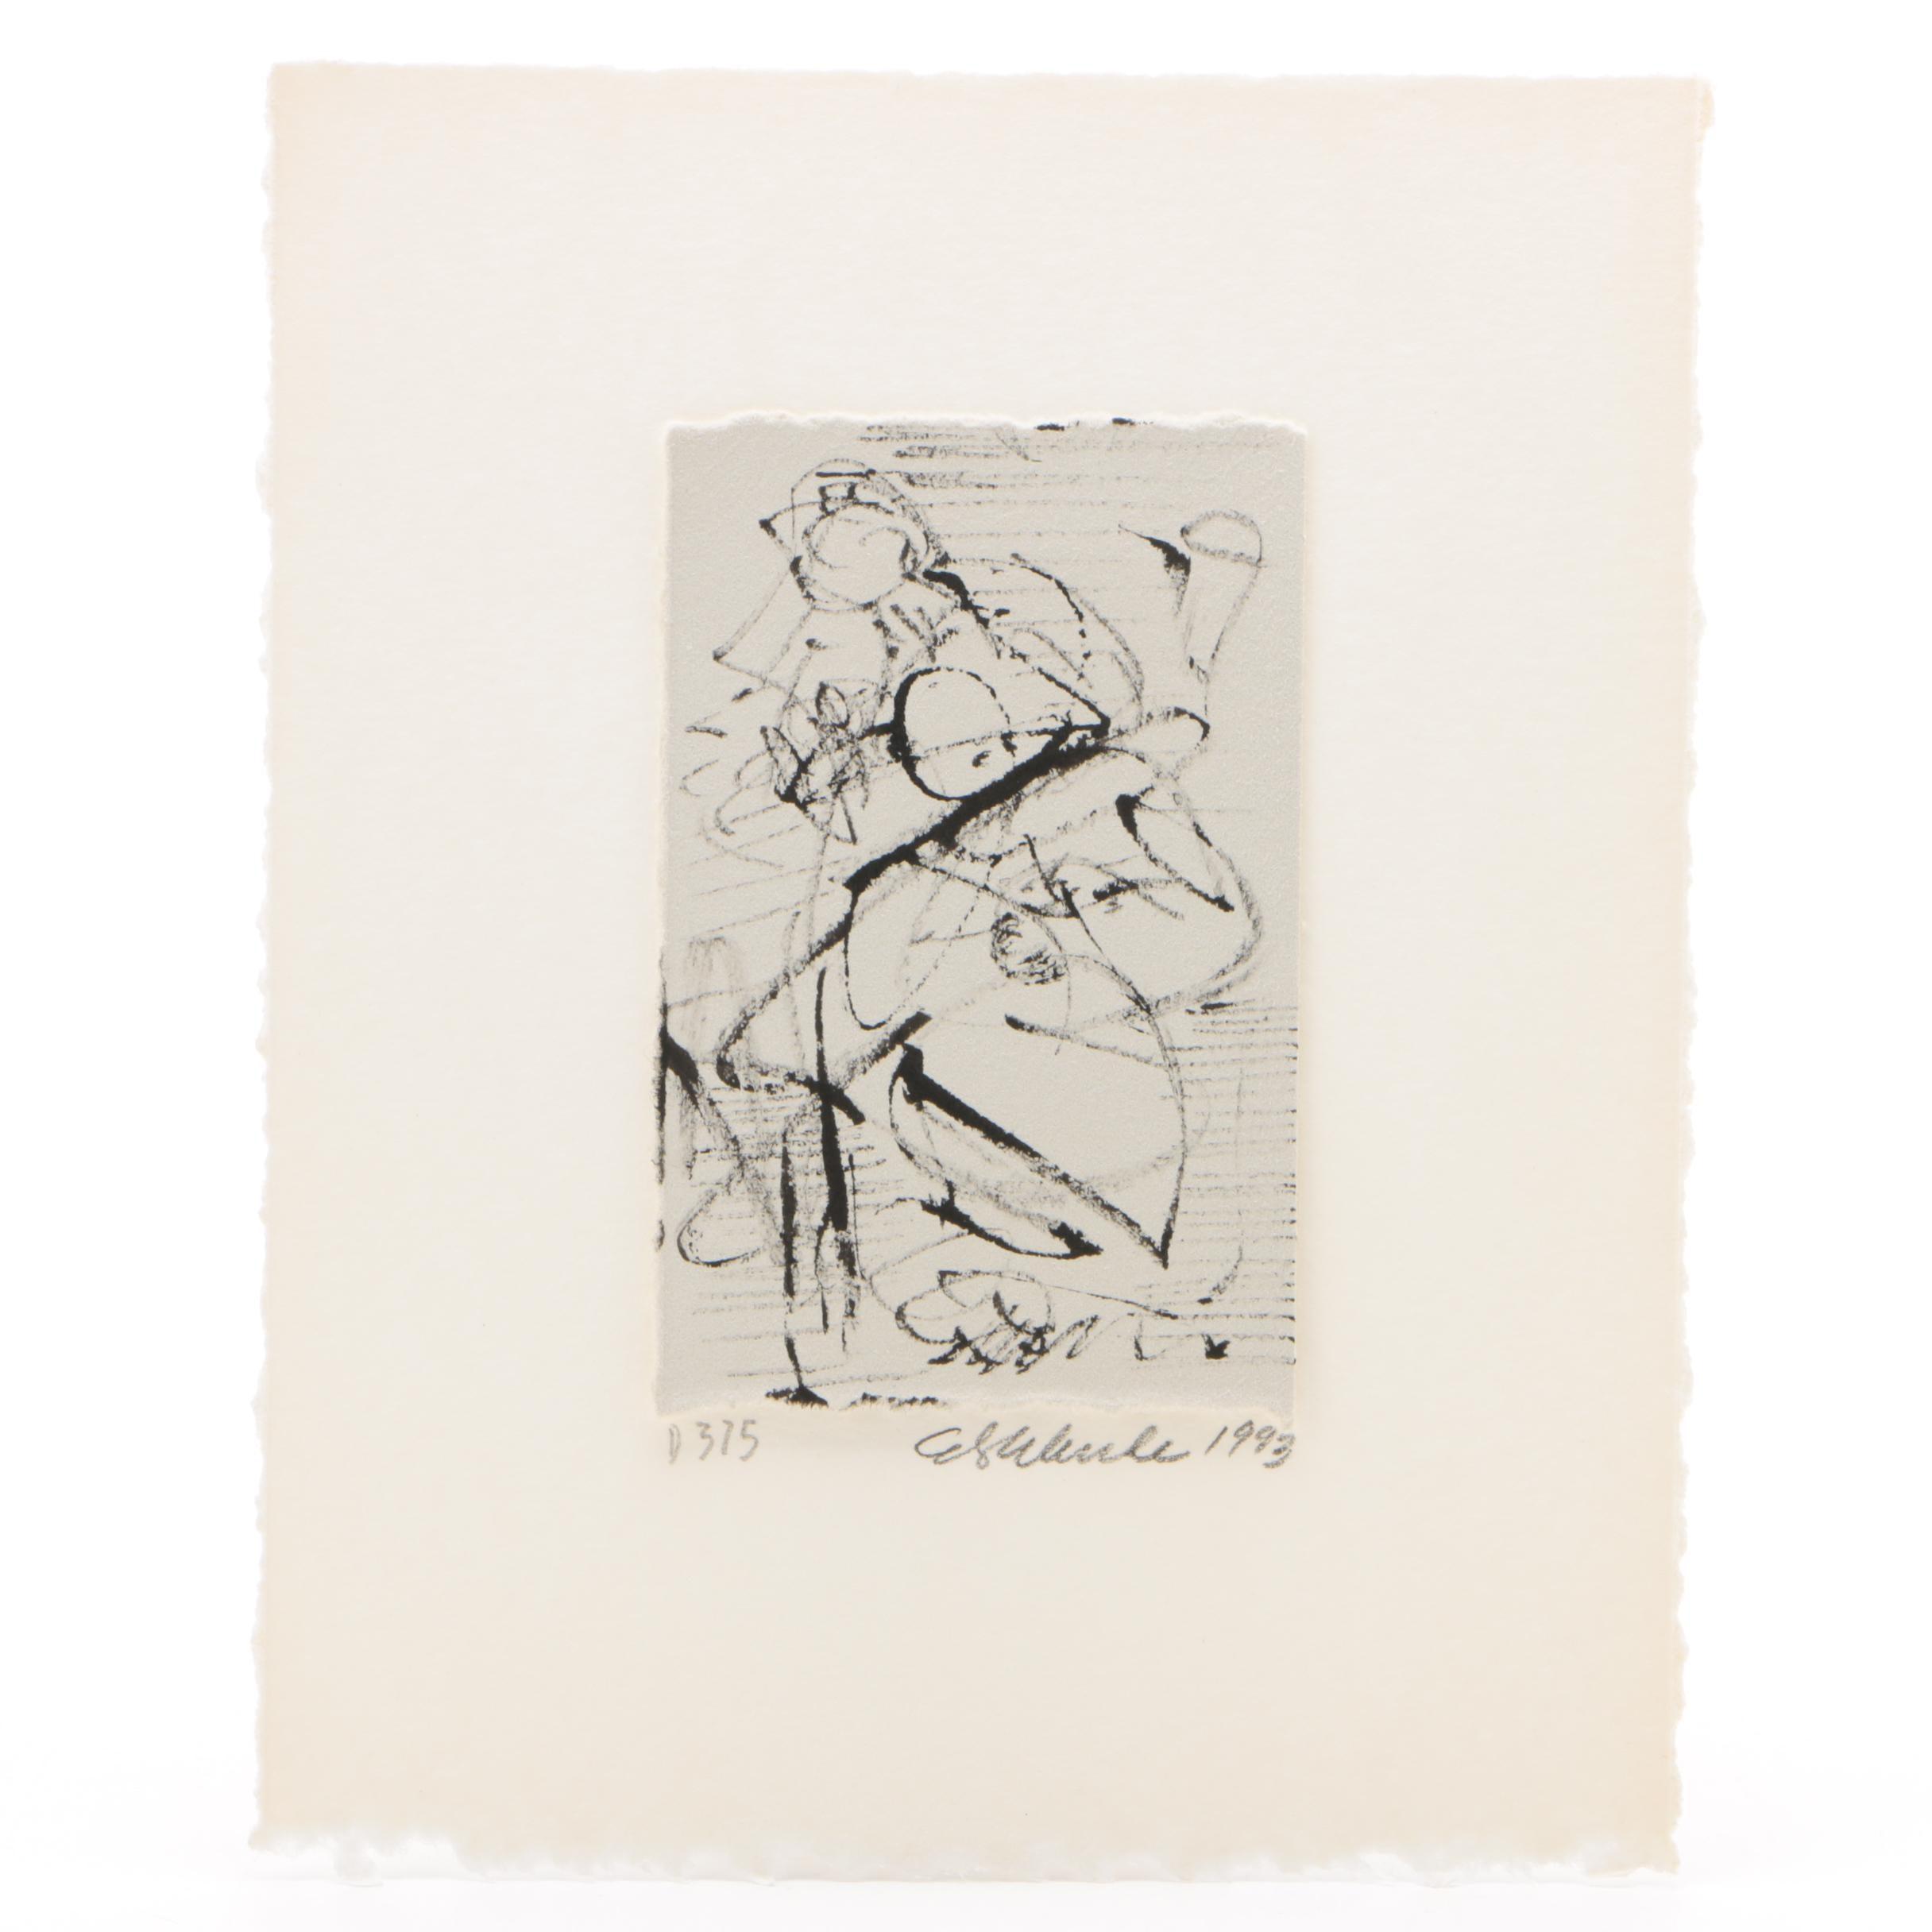 Edward Eberle 1993 Linear Ink Drawing